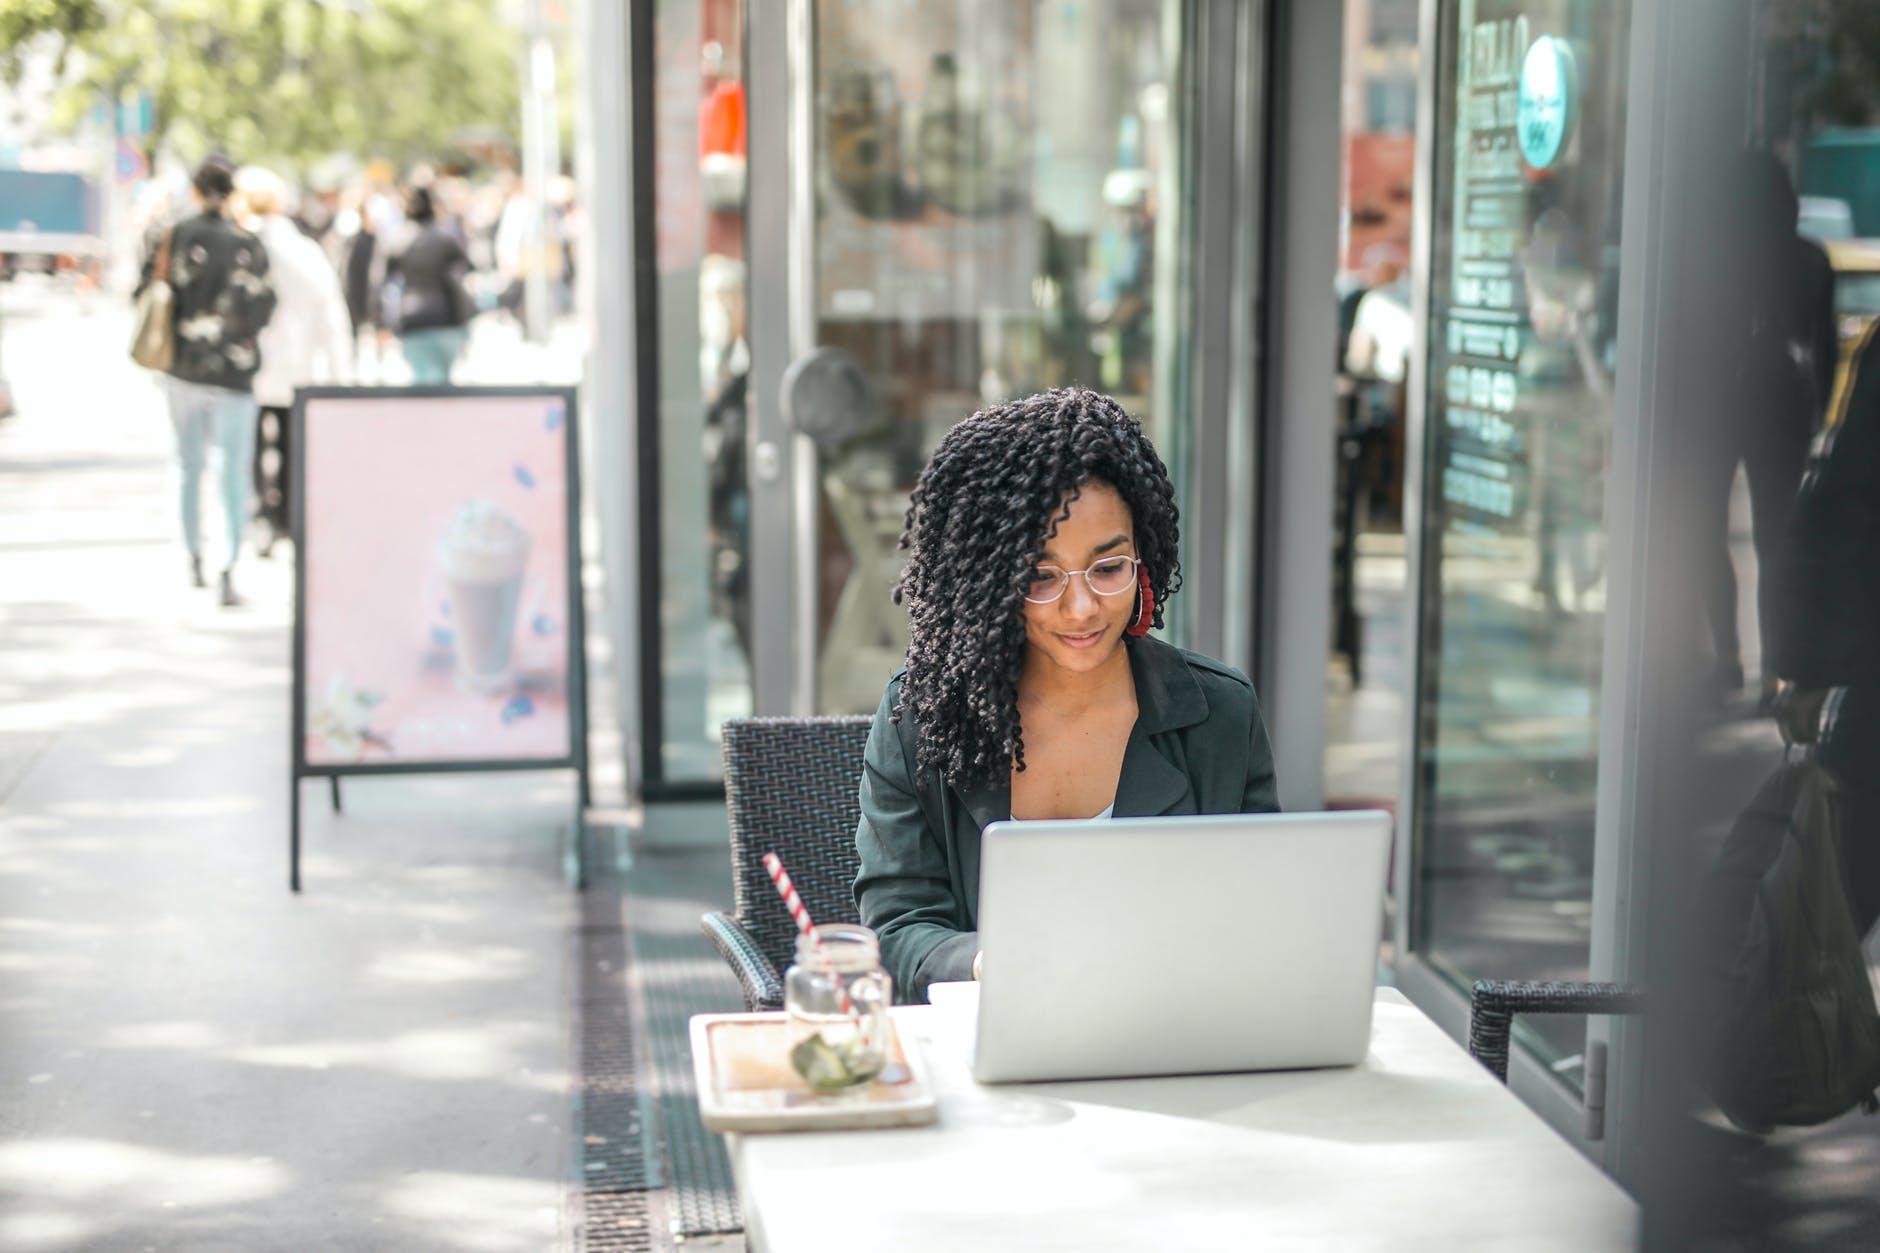 Woman uses laptop outside a café